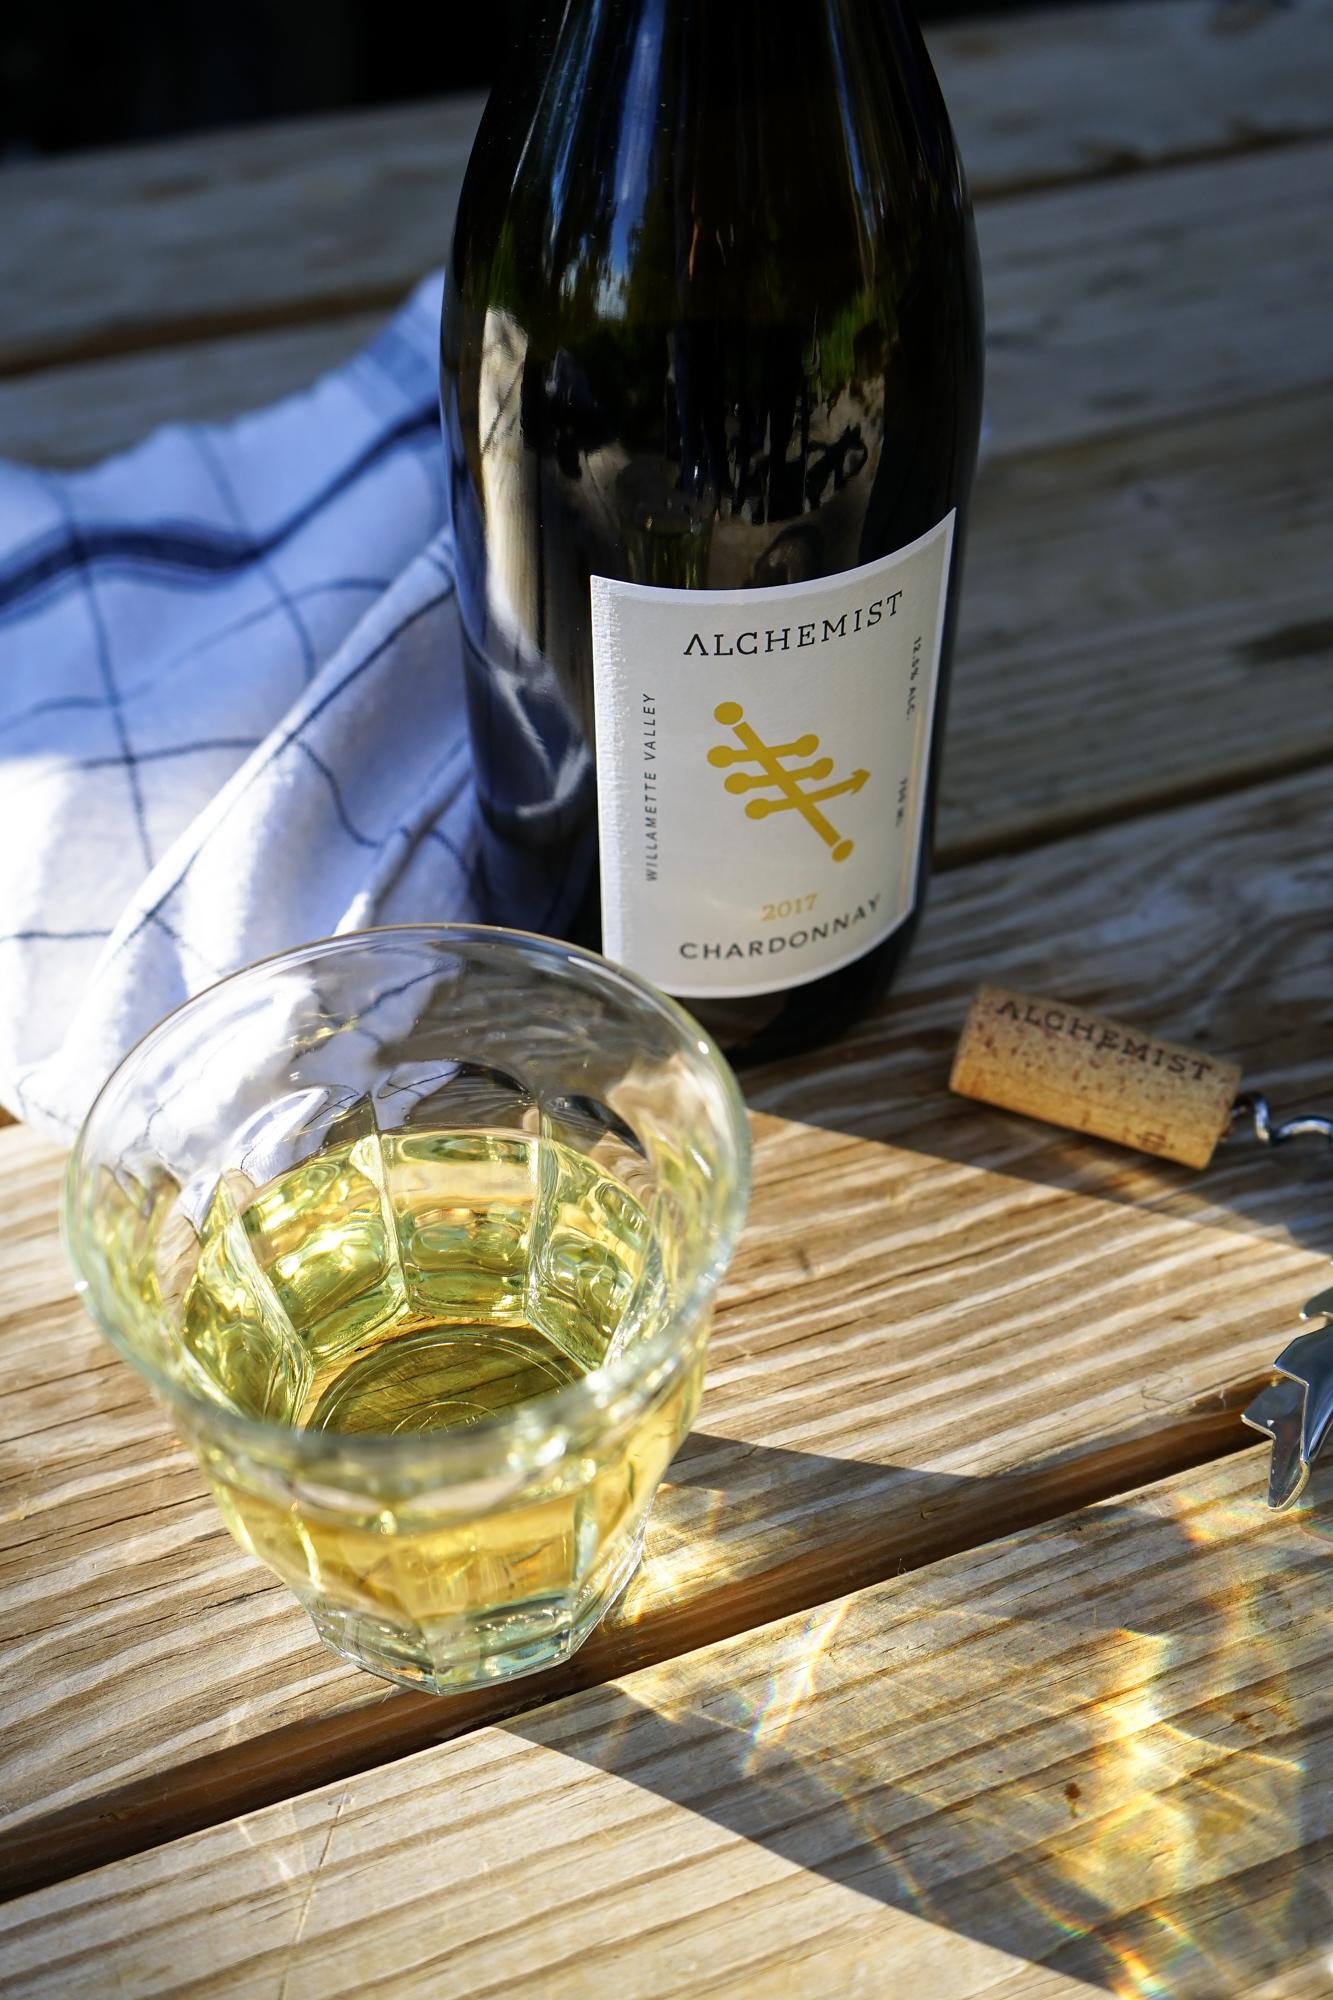 Alchemist Chardonnay